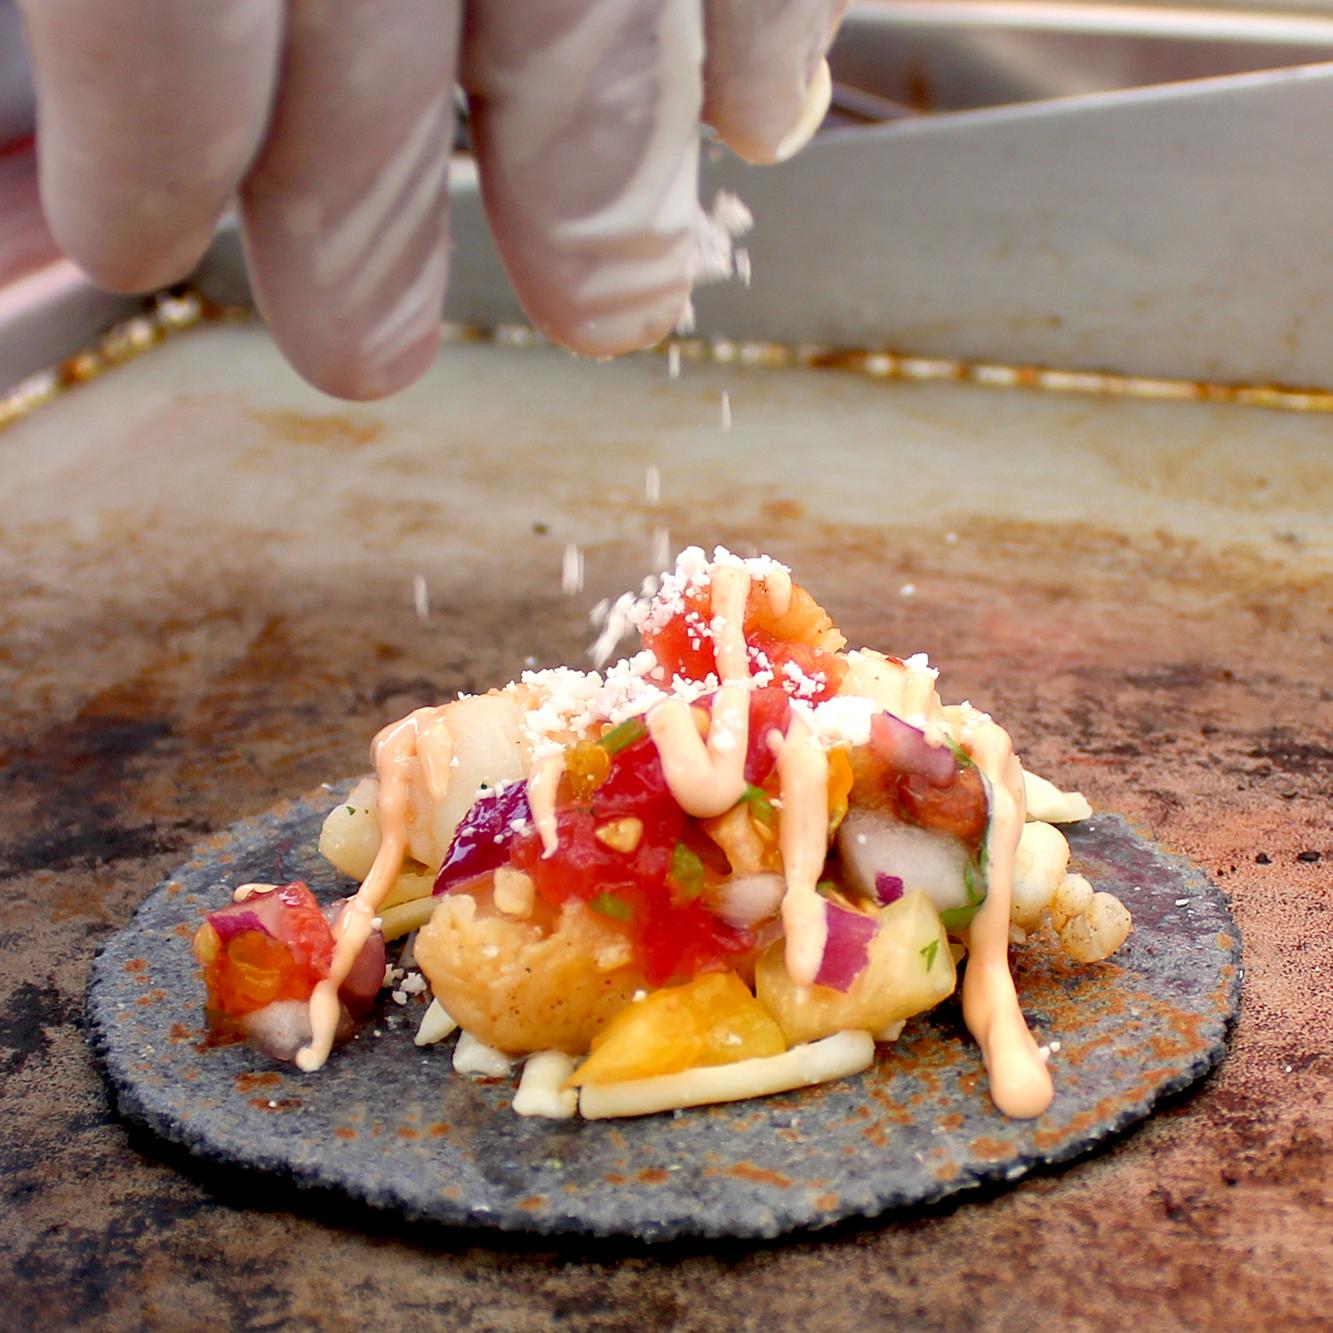 SoHo Taco Gourmet Taco Truck - Lobster Taco Blue Corn Tortilla - Orange County CA